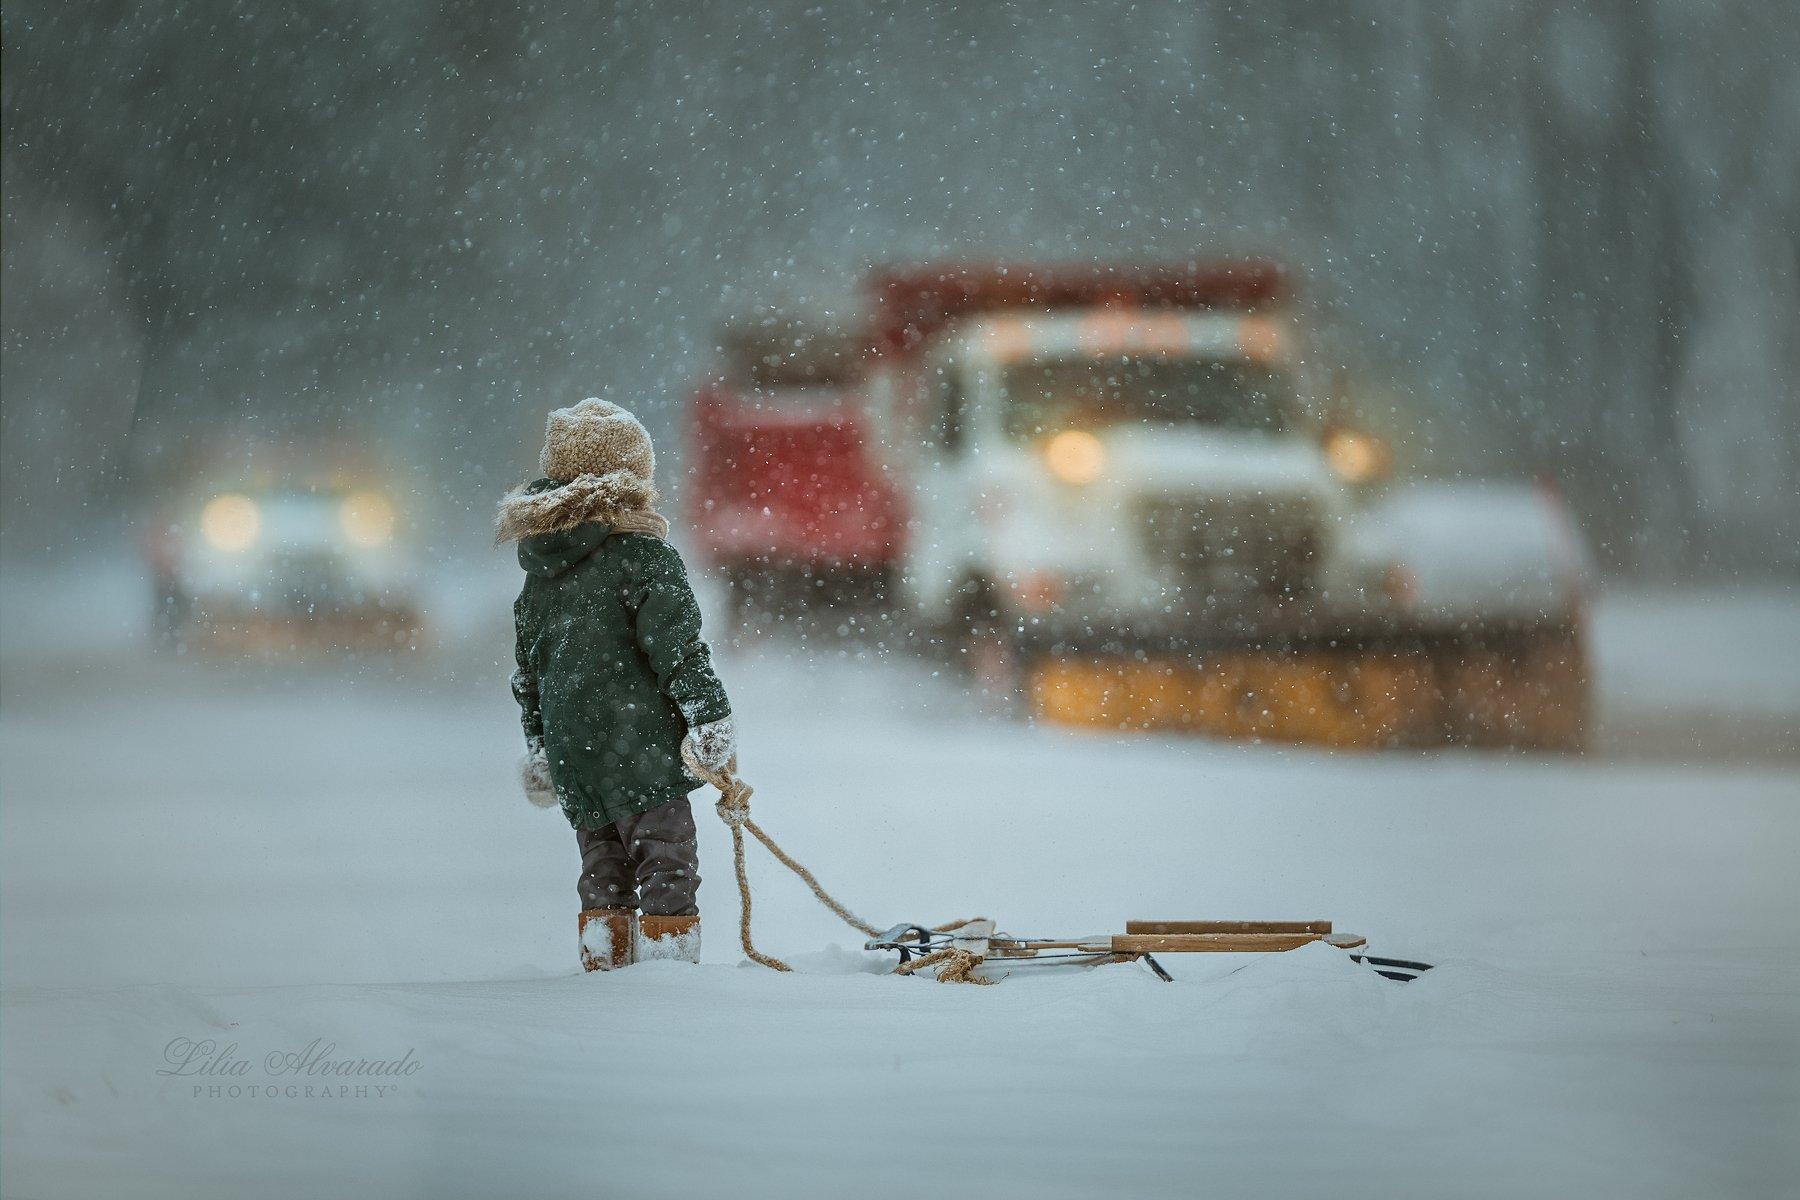 Child, Sled, Snow, Winter, Lilia Alvarado